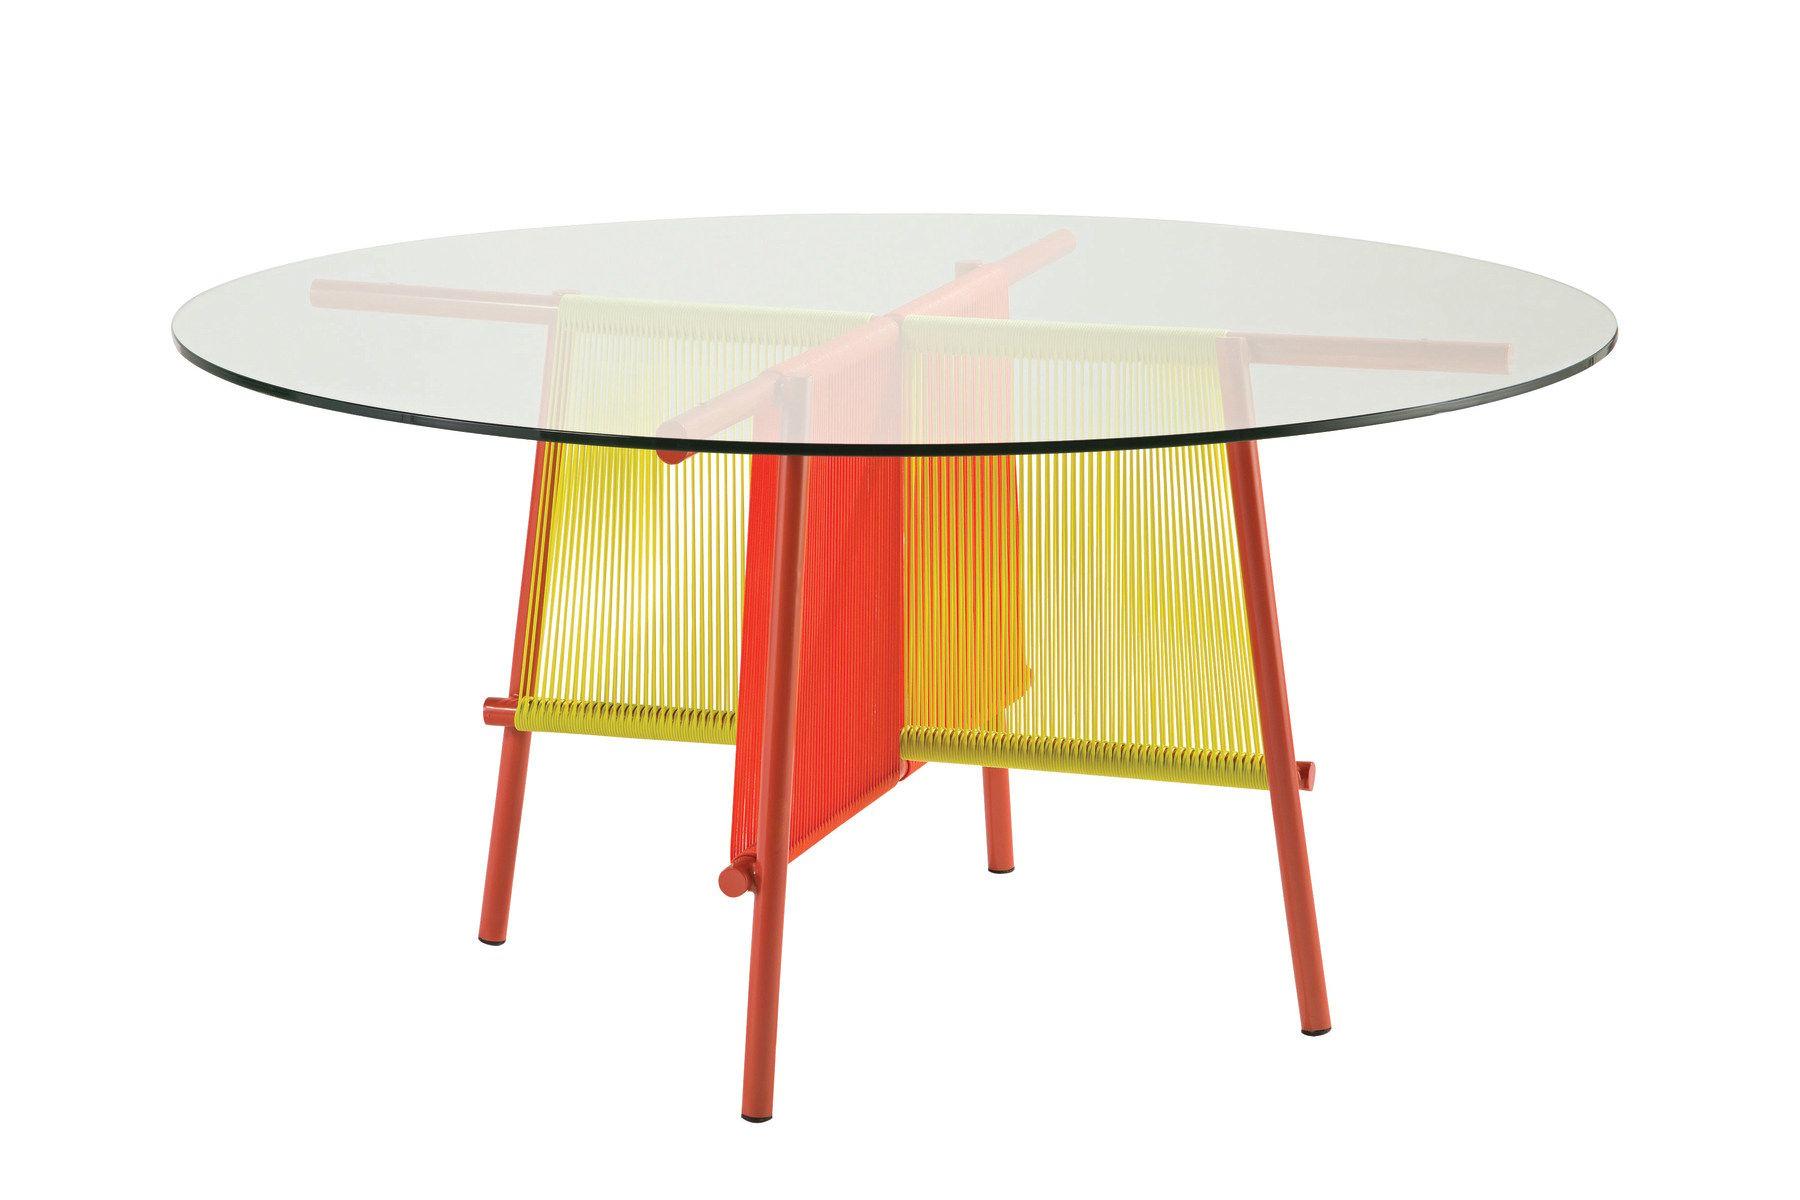 The traveler table collection the traveler by roche bobois - Table roche bobois ...